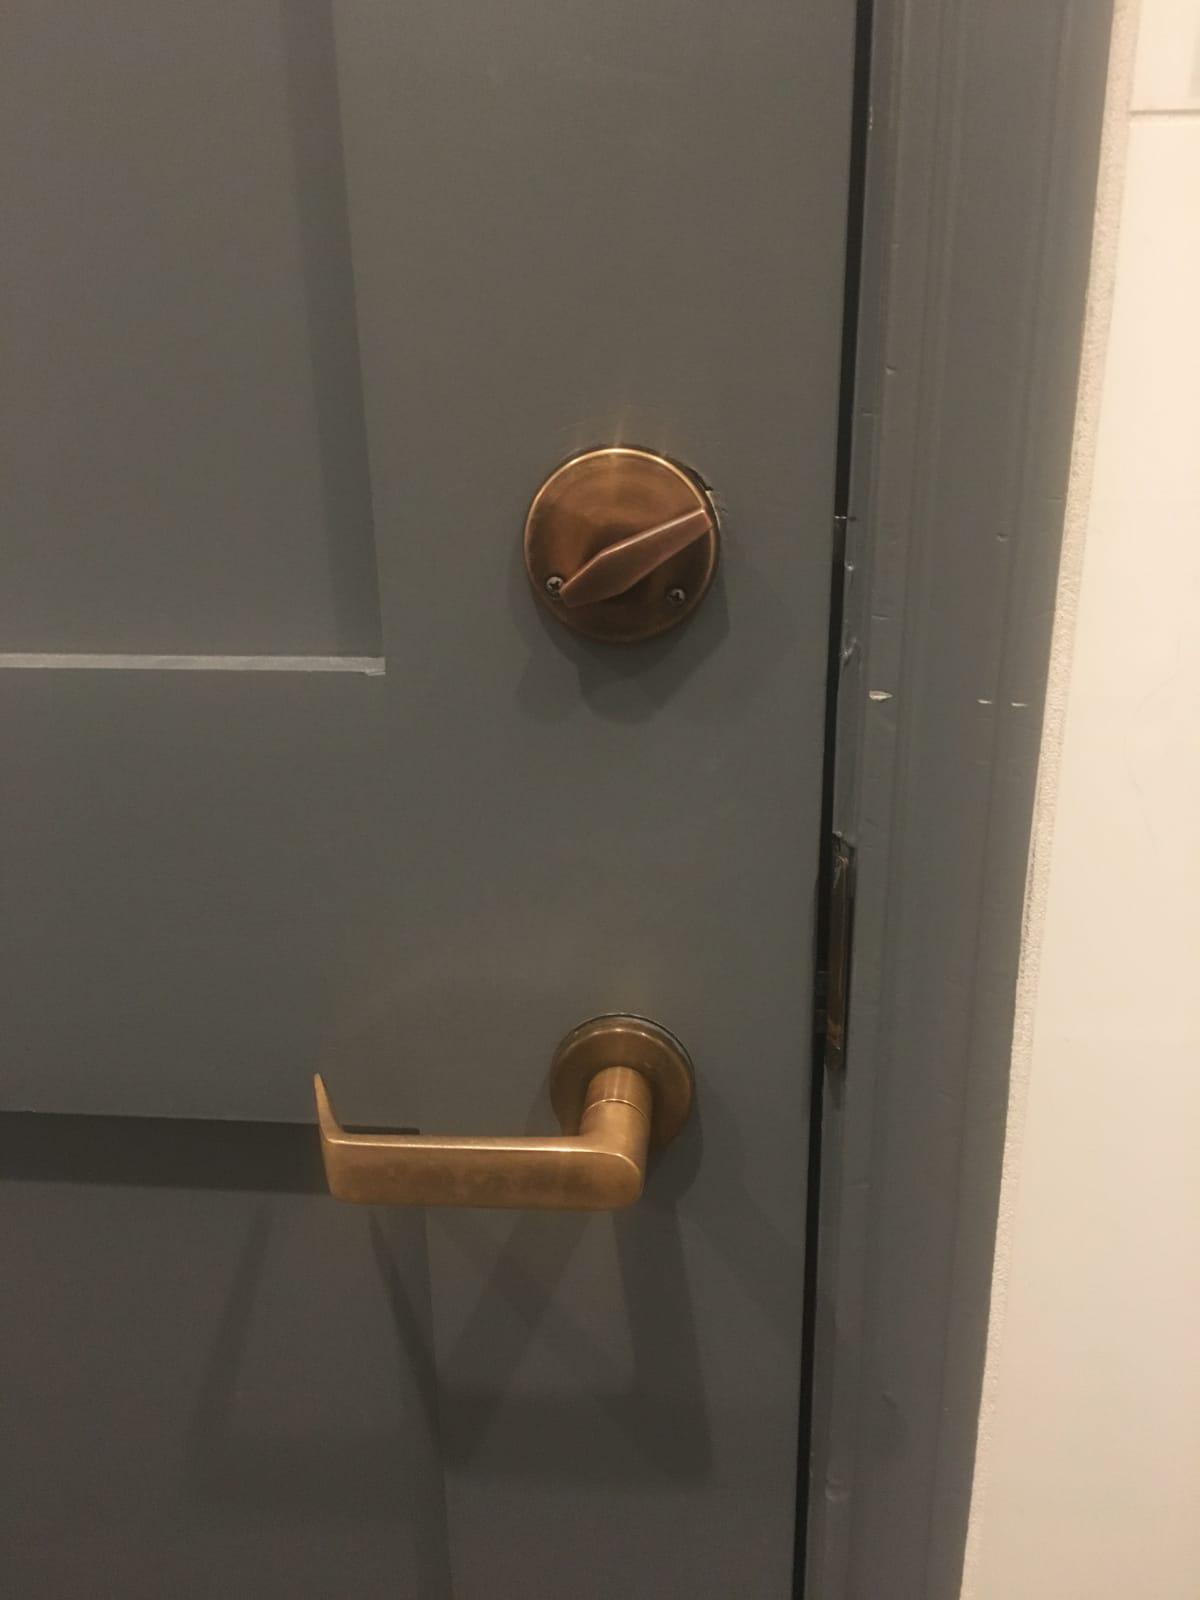 Locksmith in Plano